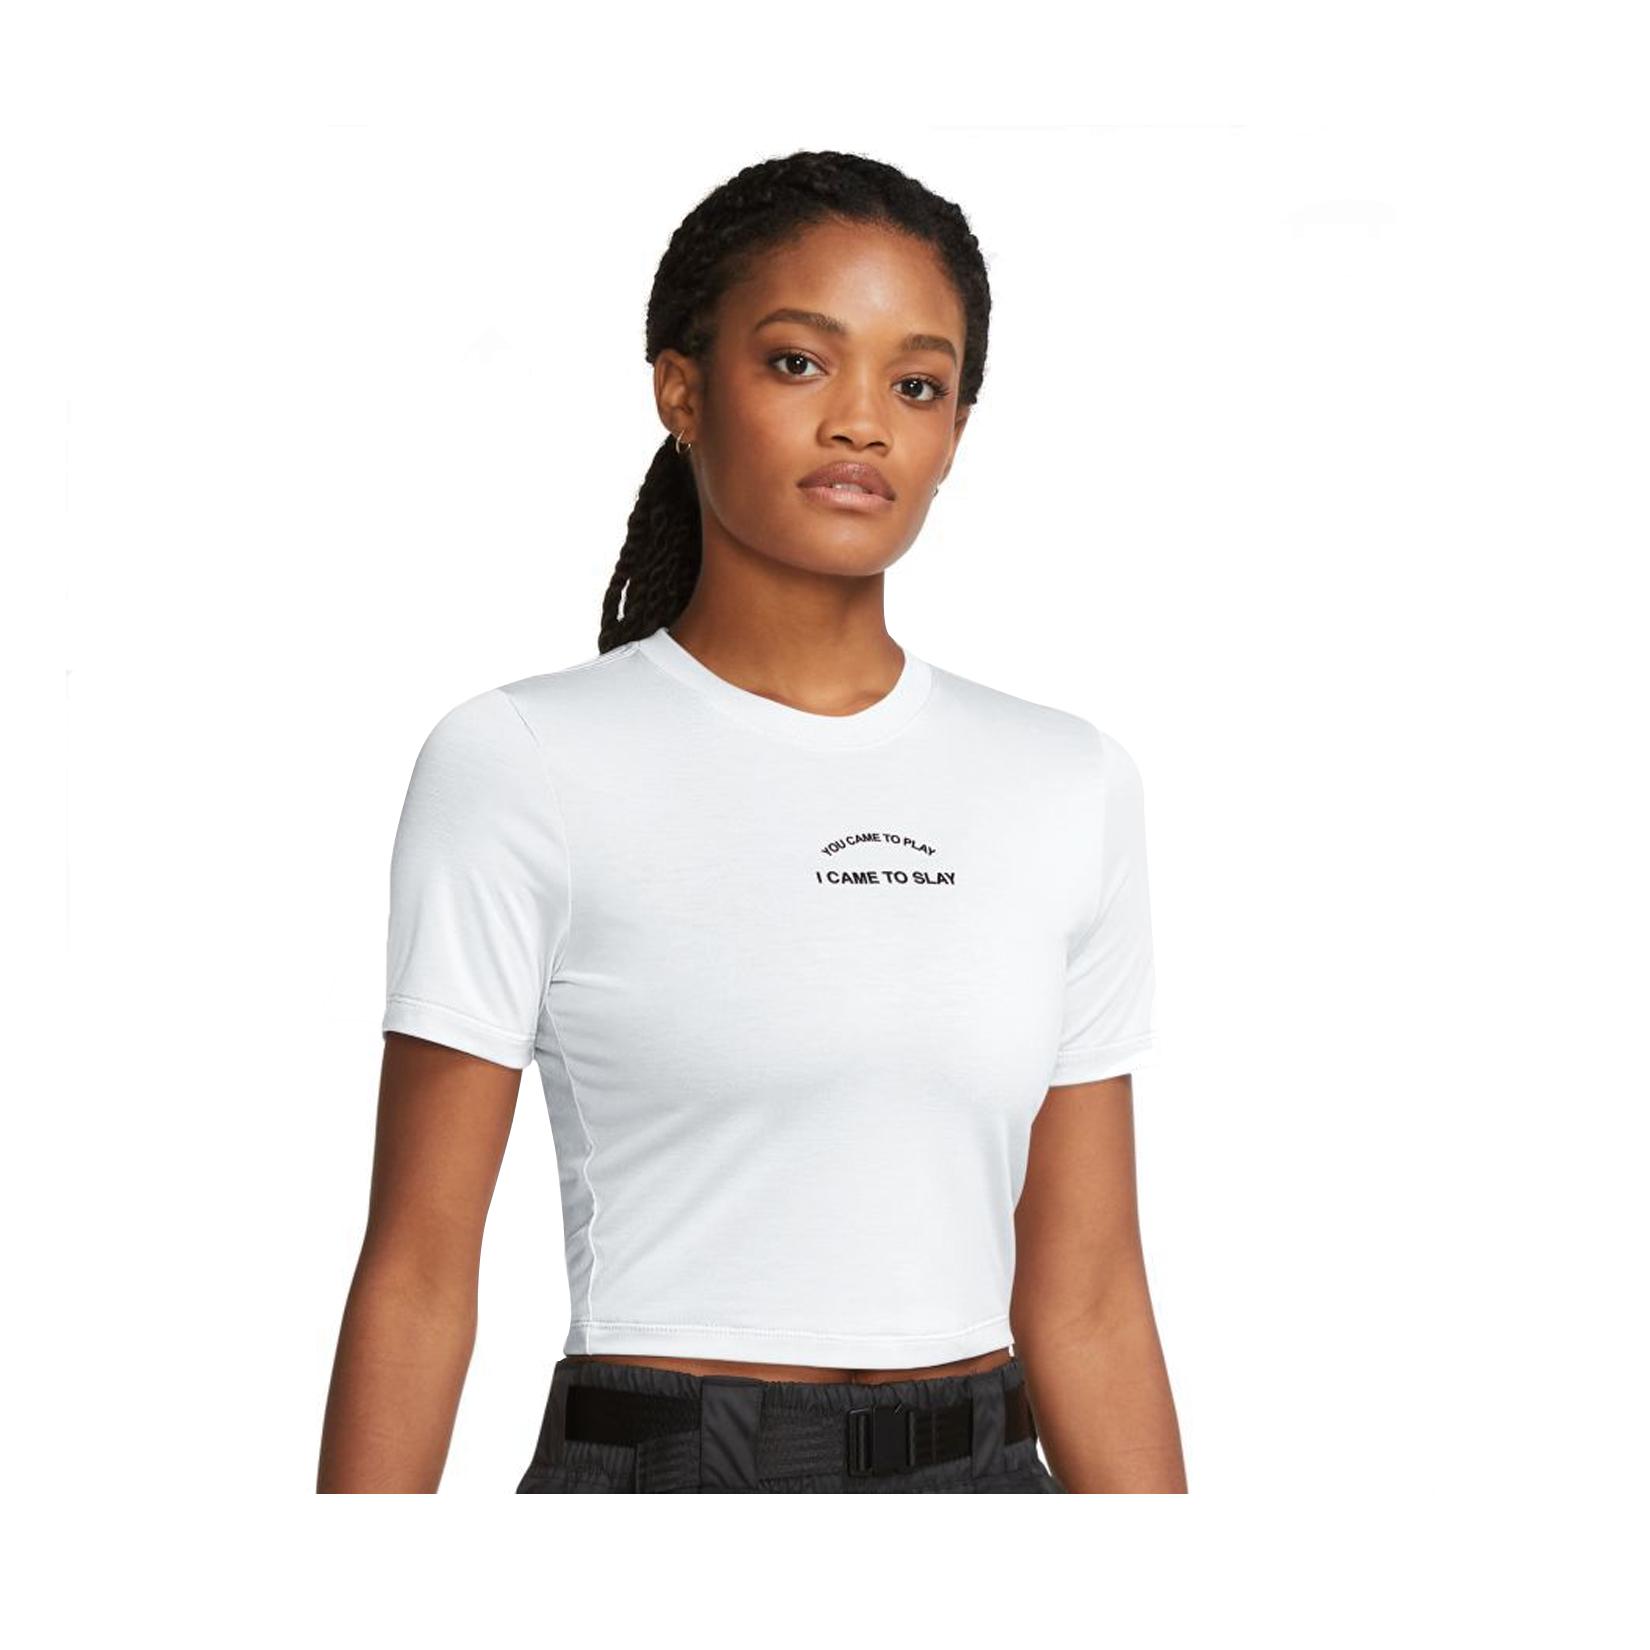 Nike Sportswear Short Sleeve Tee White